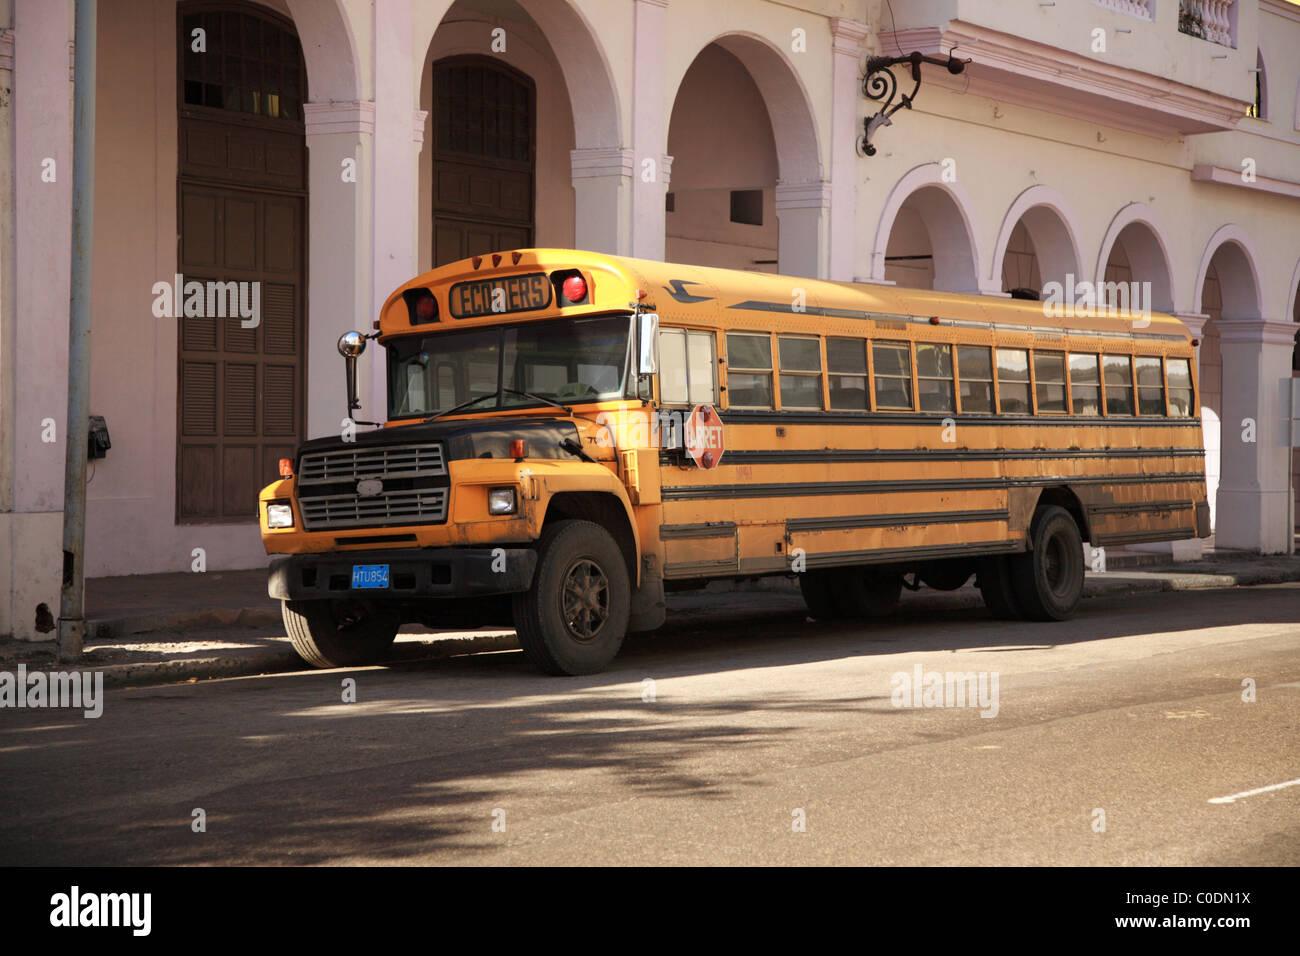 School Bus Stock Photos & School Bus Stock Images - Alamy